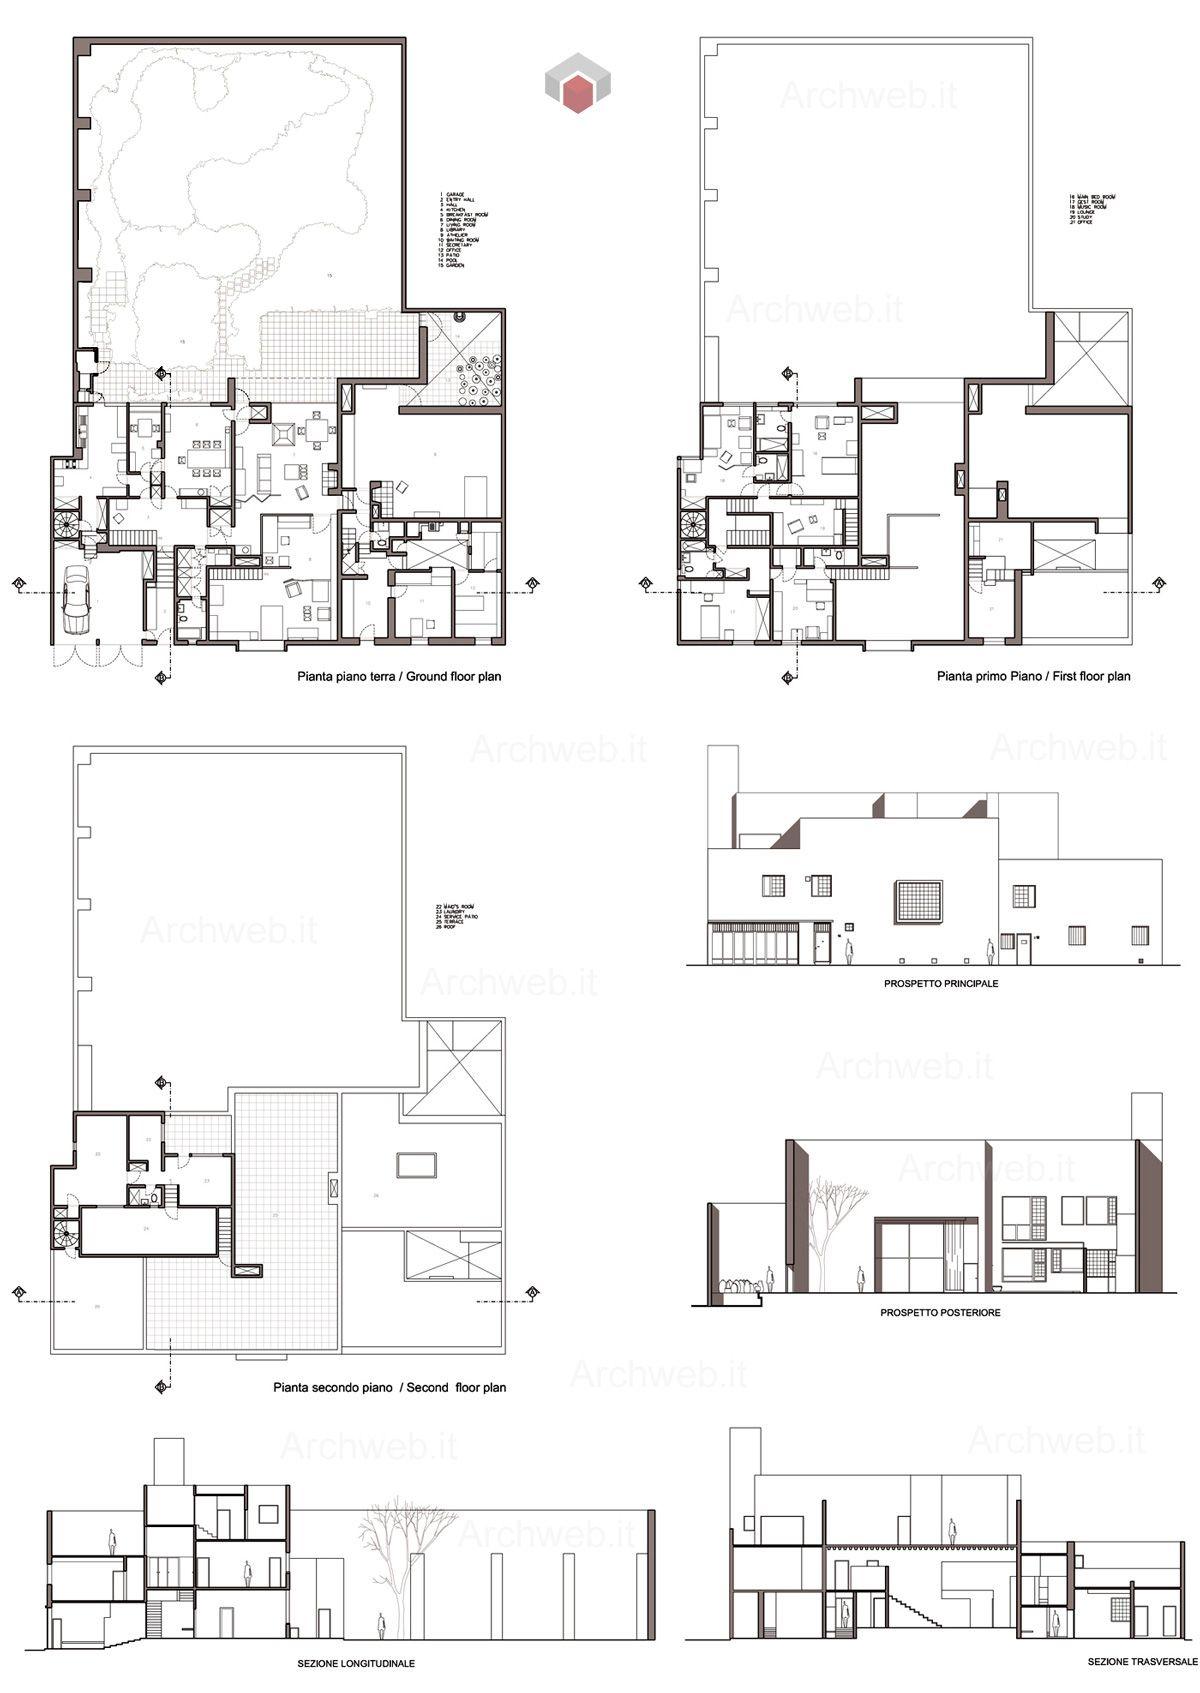 Barrag n house and studio dwg drawings i maestri luis for Strumento di disegno di architettura online